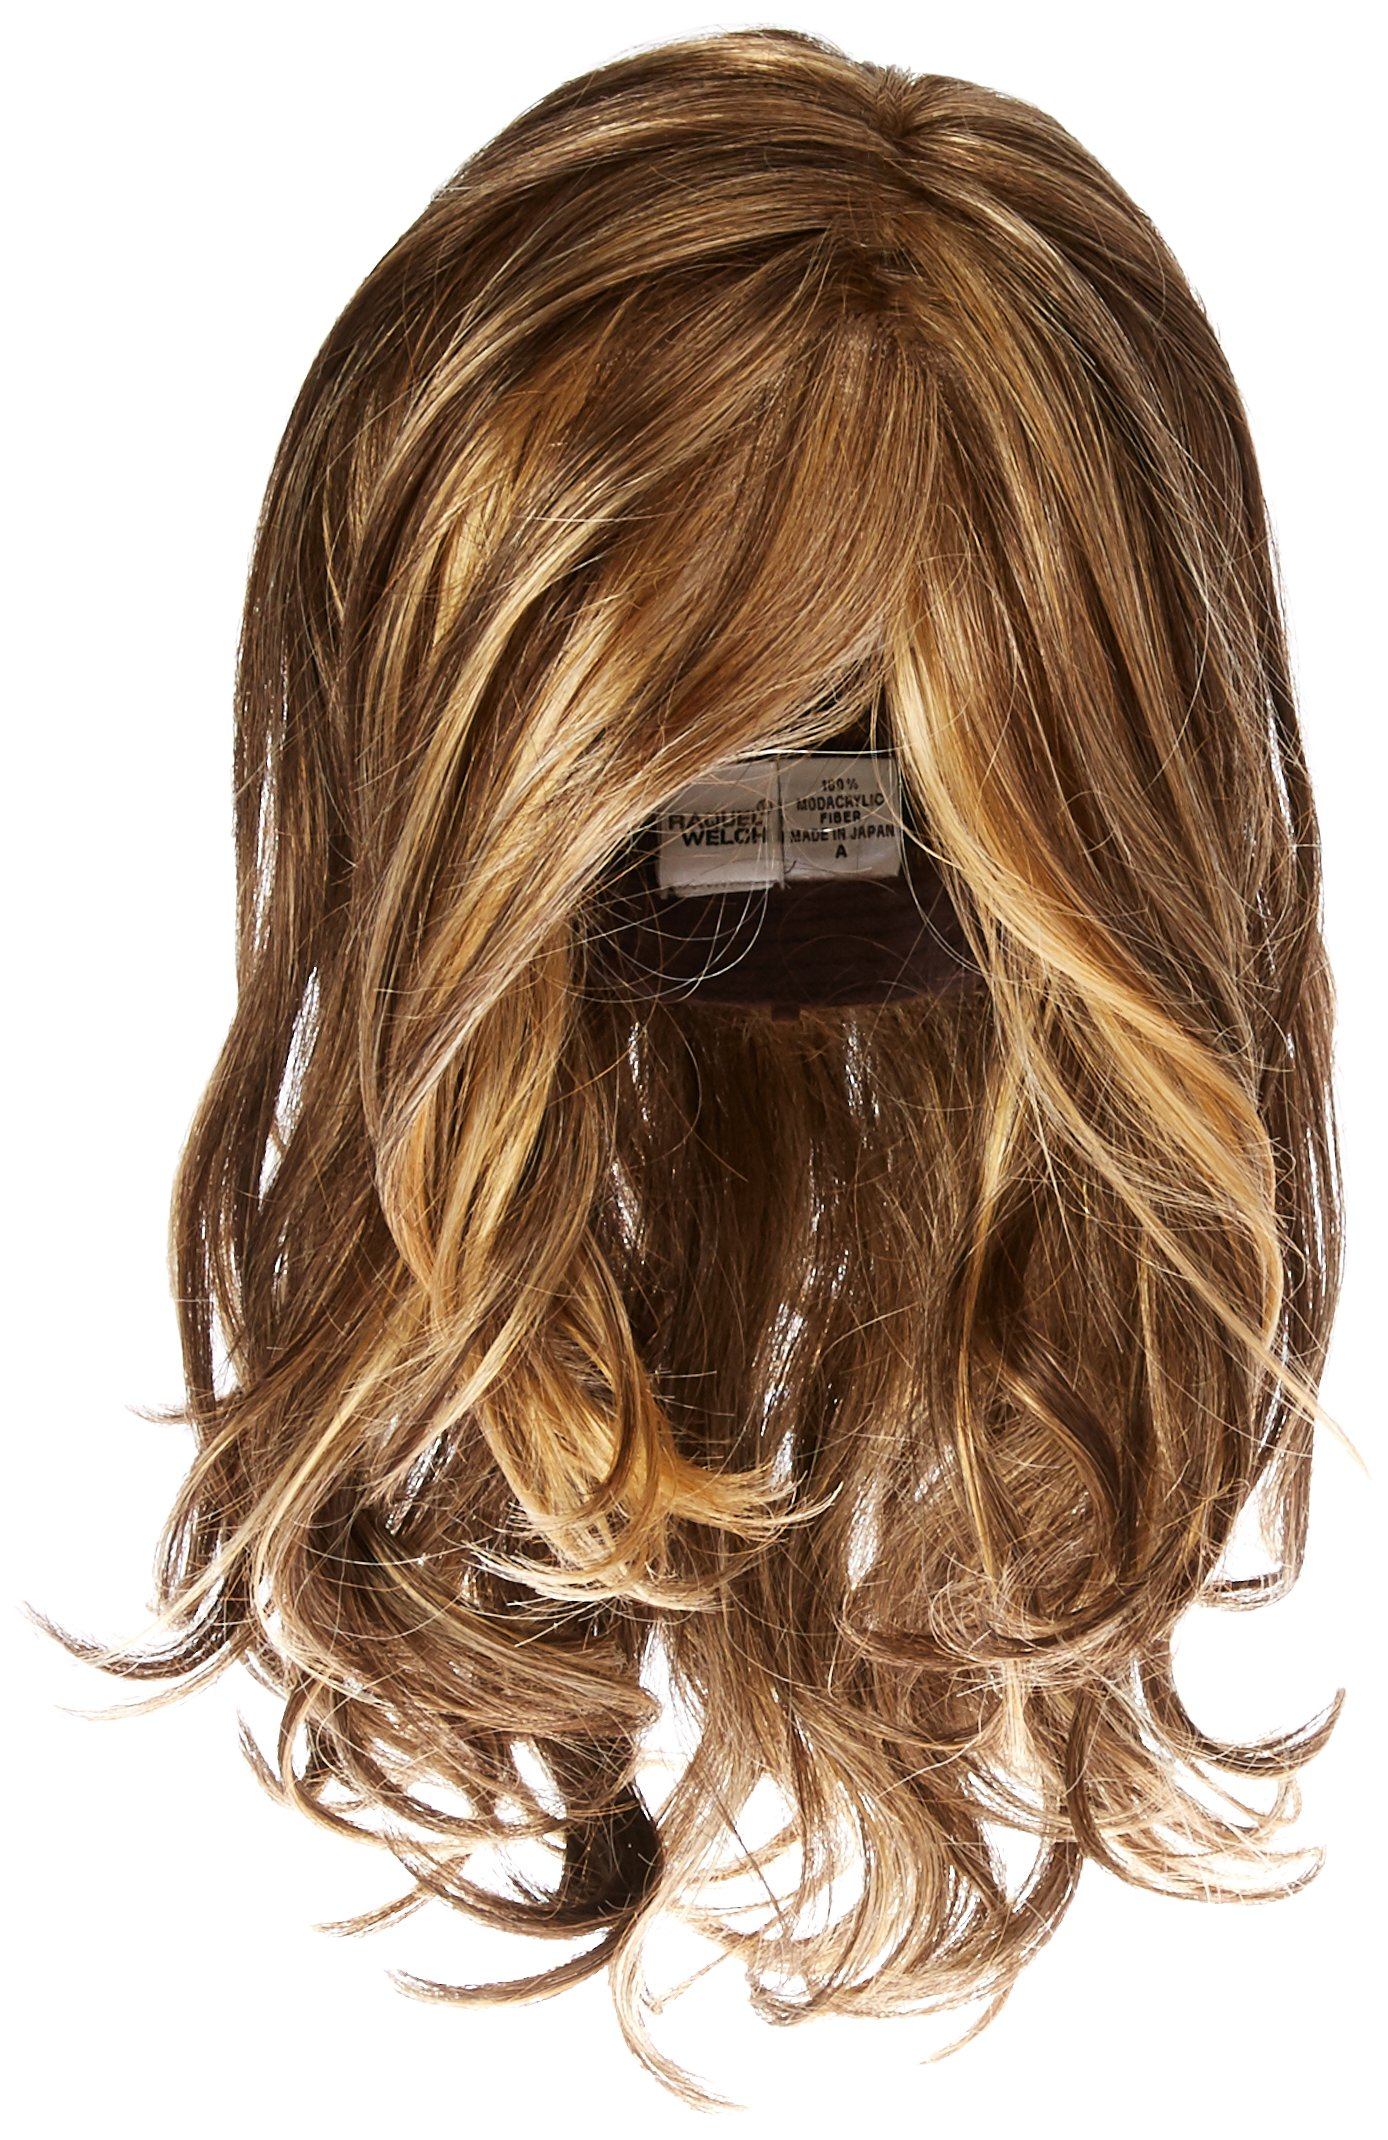 Hairdo Love Love Love Long Full Length Straight Hair With Soft Natural Wave Highlights, R11S+ Glazed Mocha by Hairuwear by Hair u wear